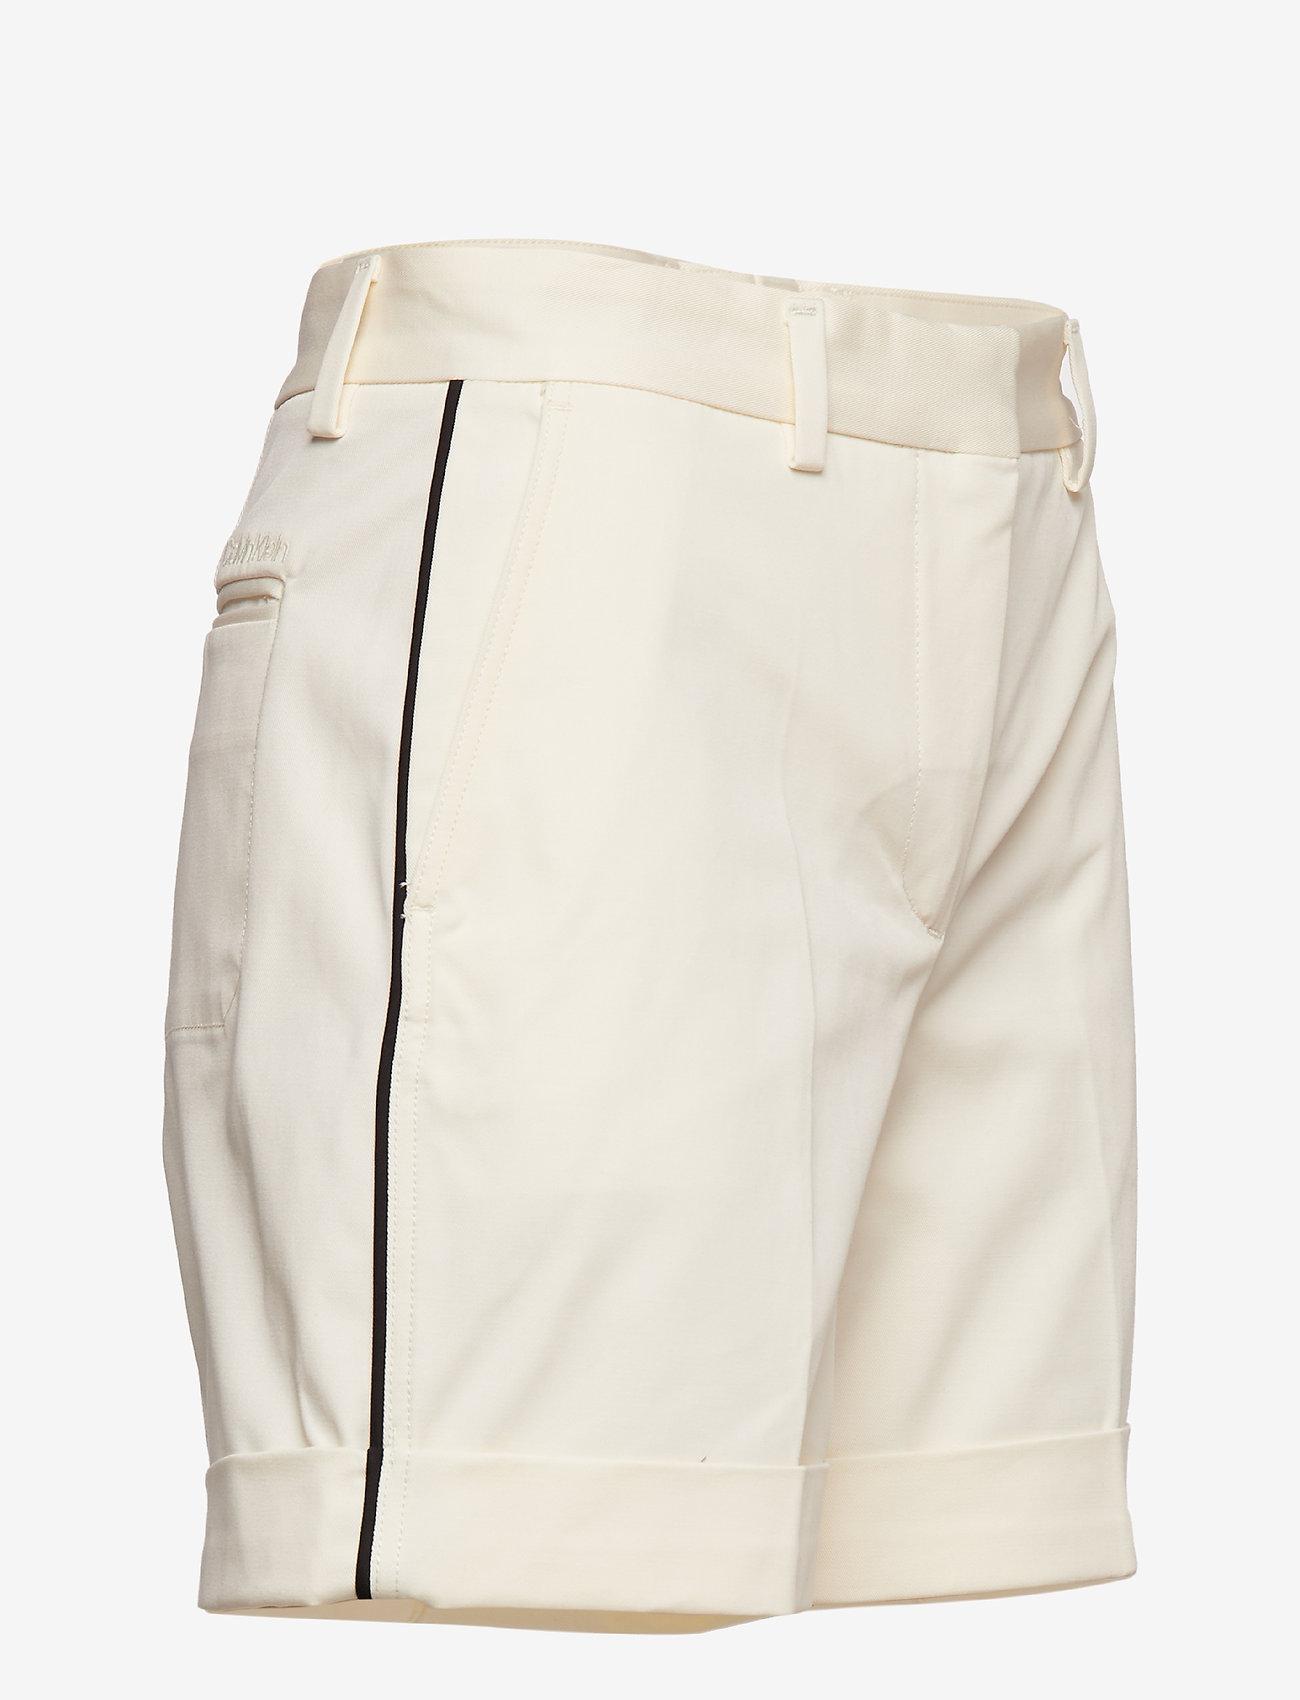 Chino Bermuda Short (Calico) (550 kr) - Calvin Klein